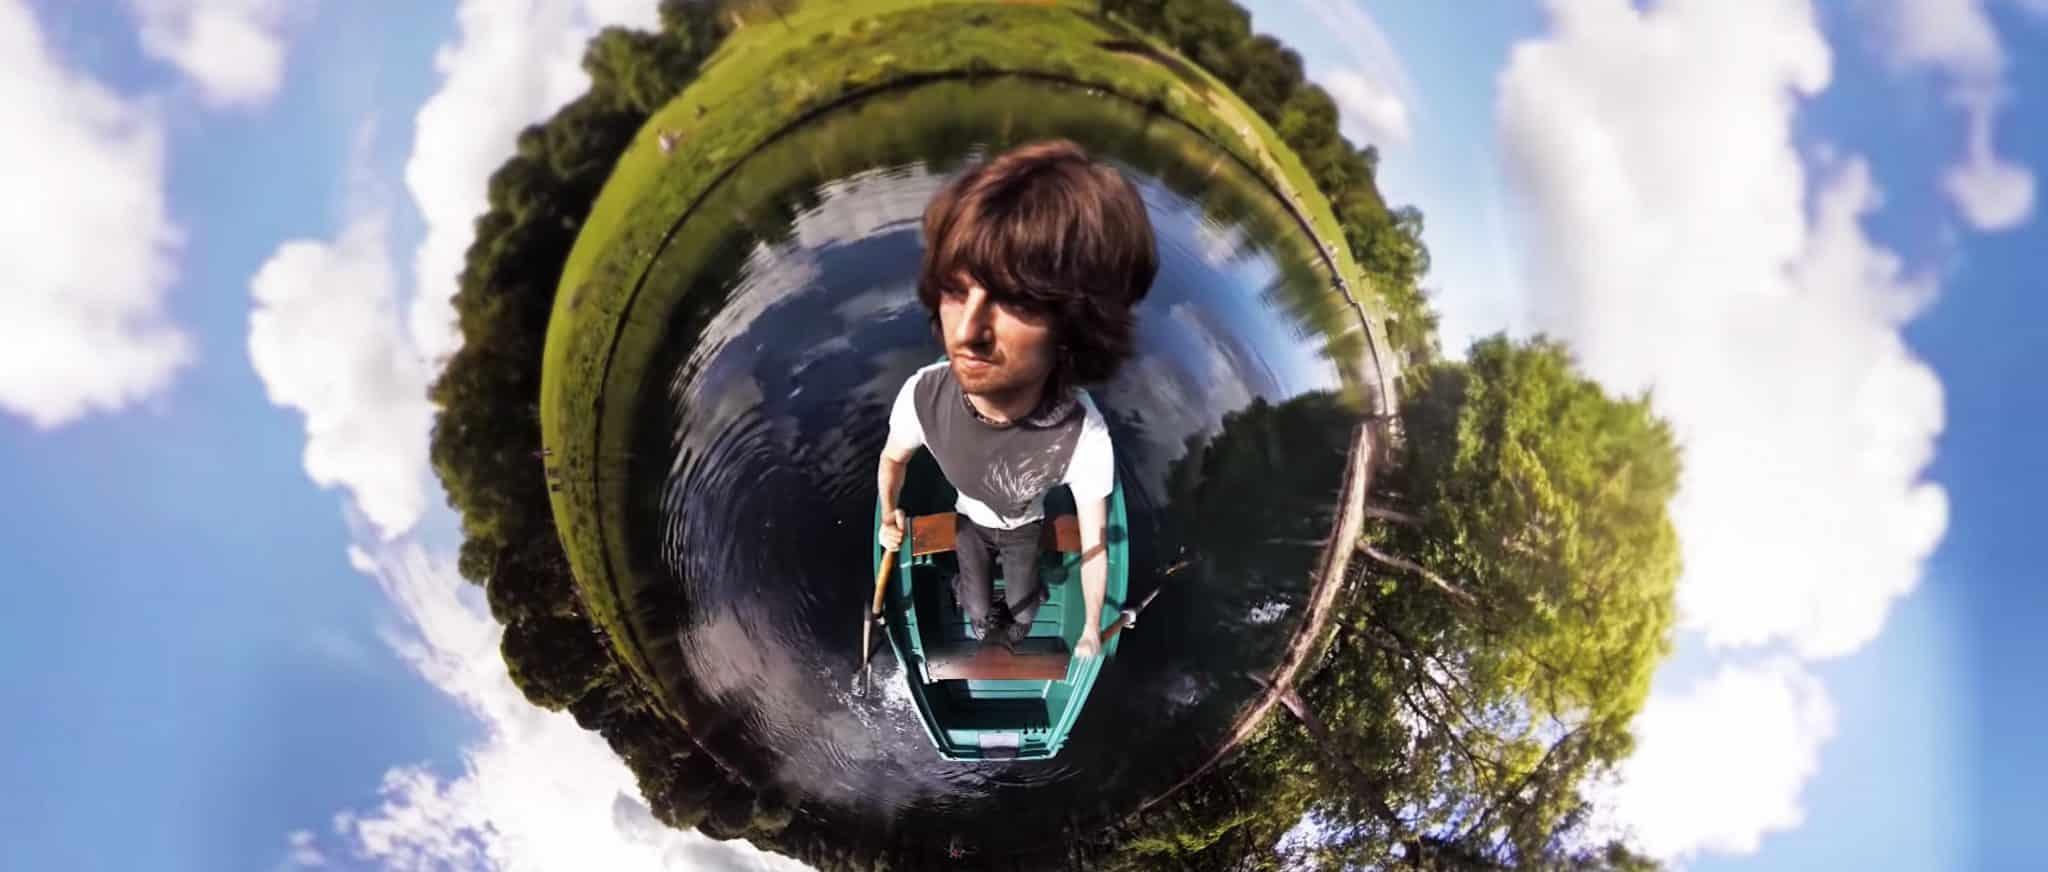 360 video for embrace shibden lake